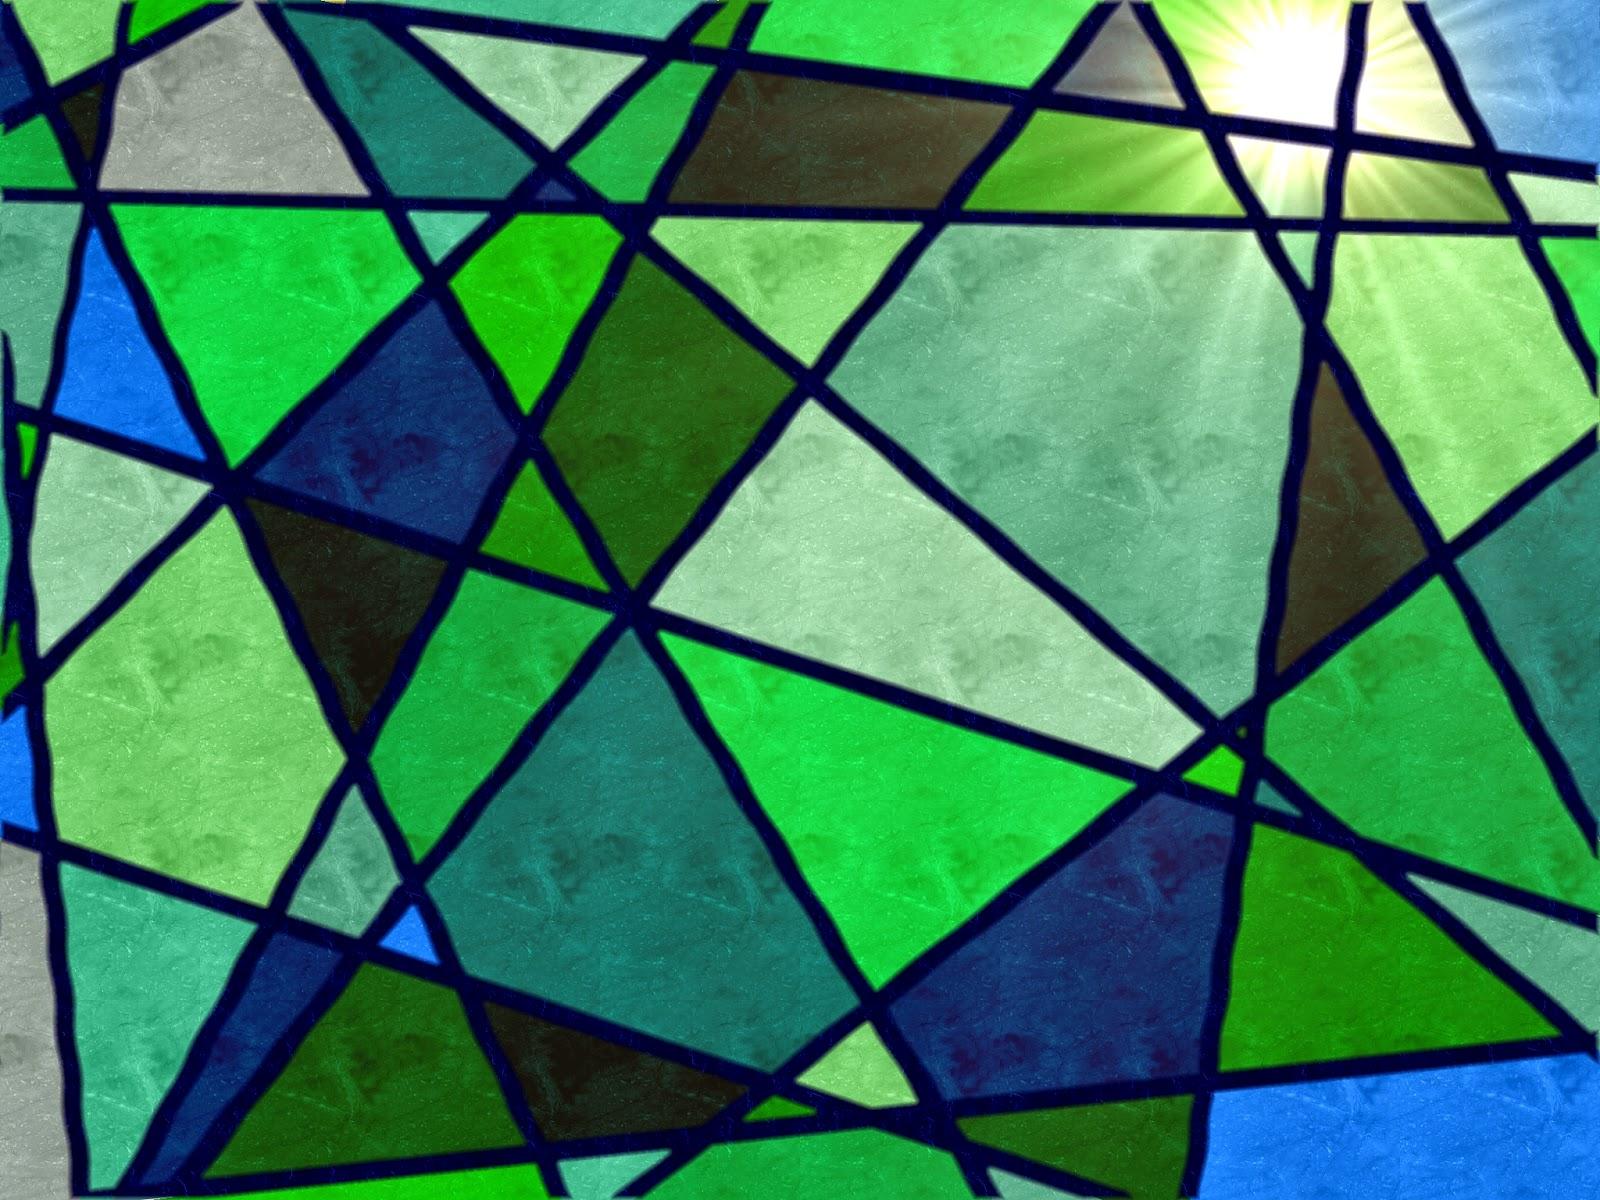 Muster Mosaik Buntglasoptik blau grün